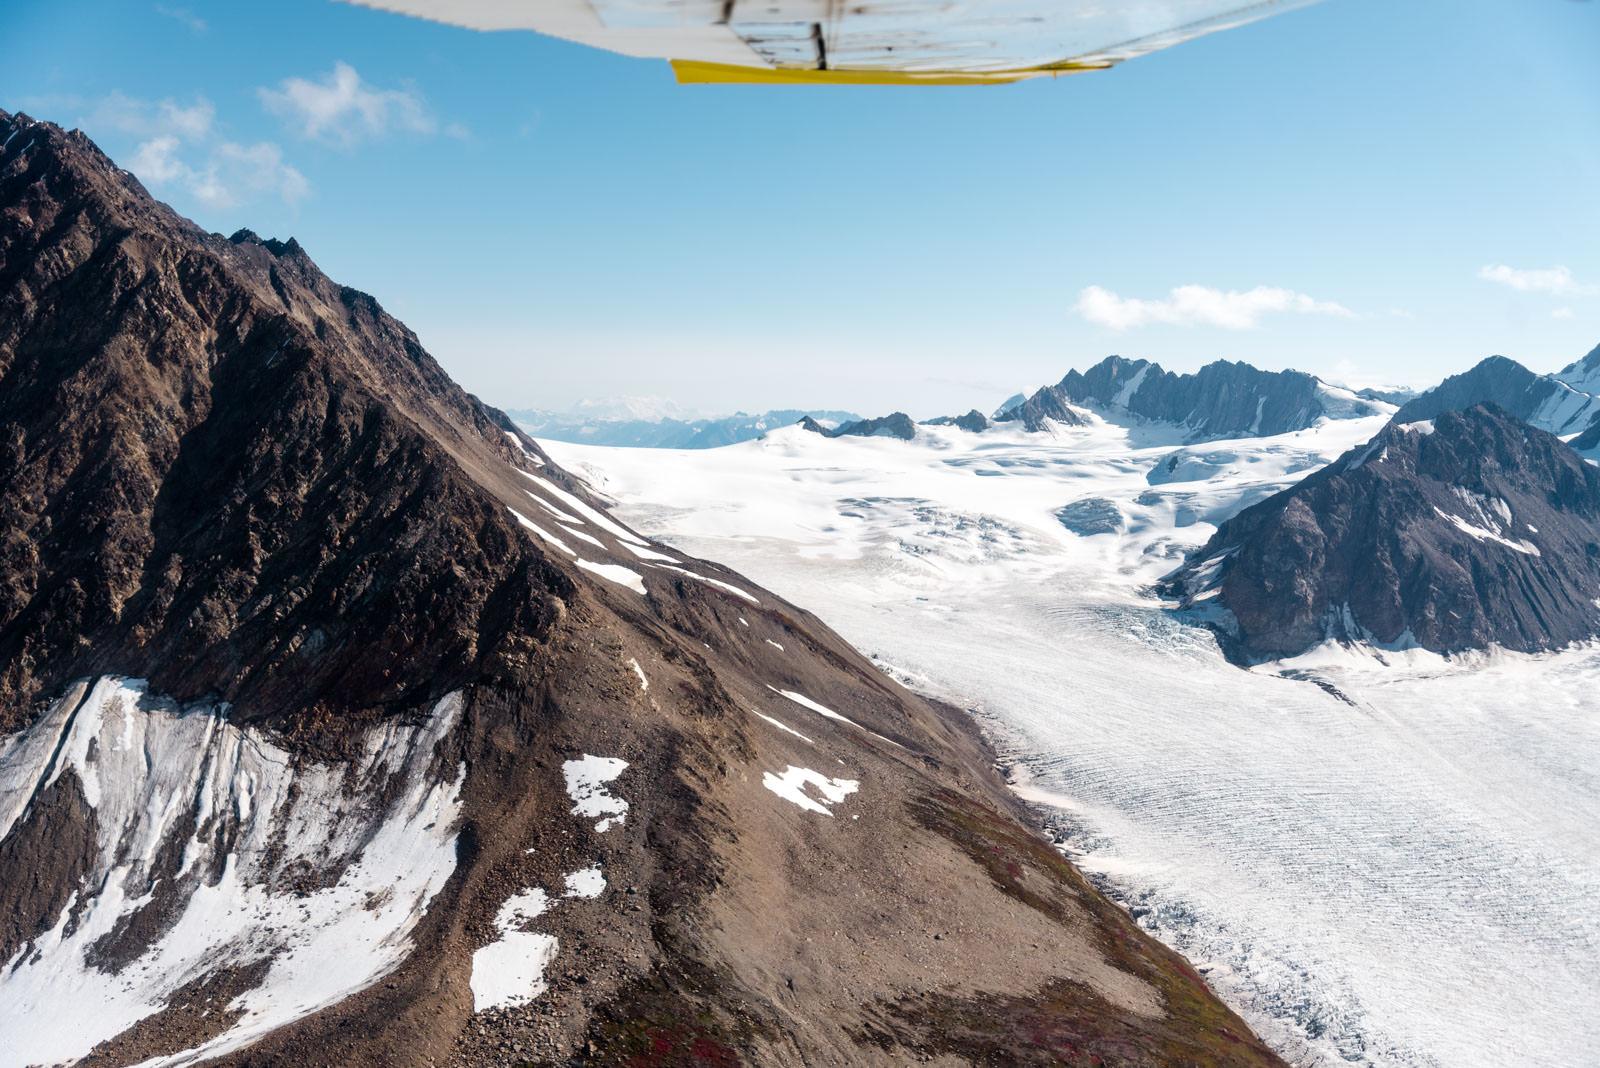 Bagley Icefield - University Range Tour: Glacier